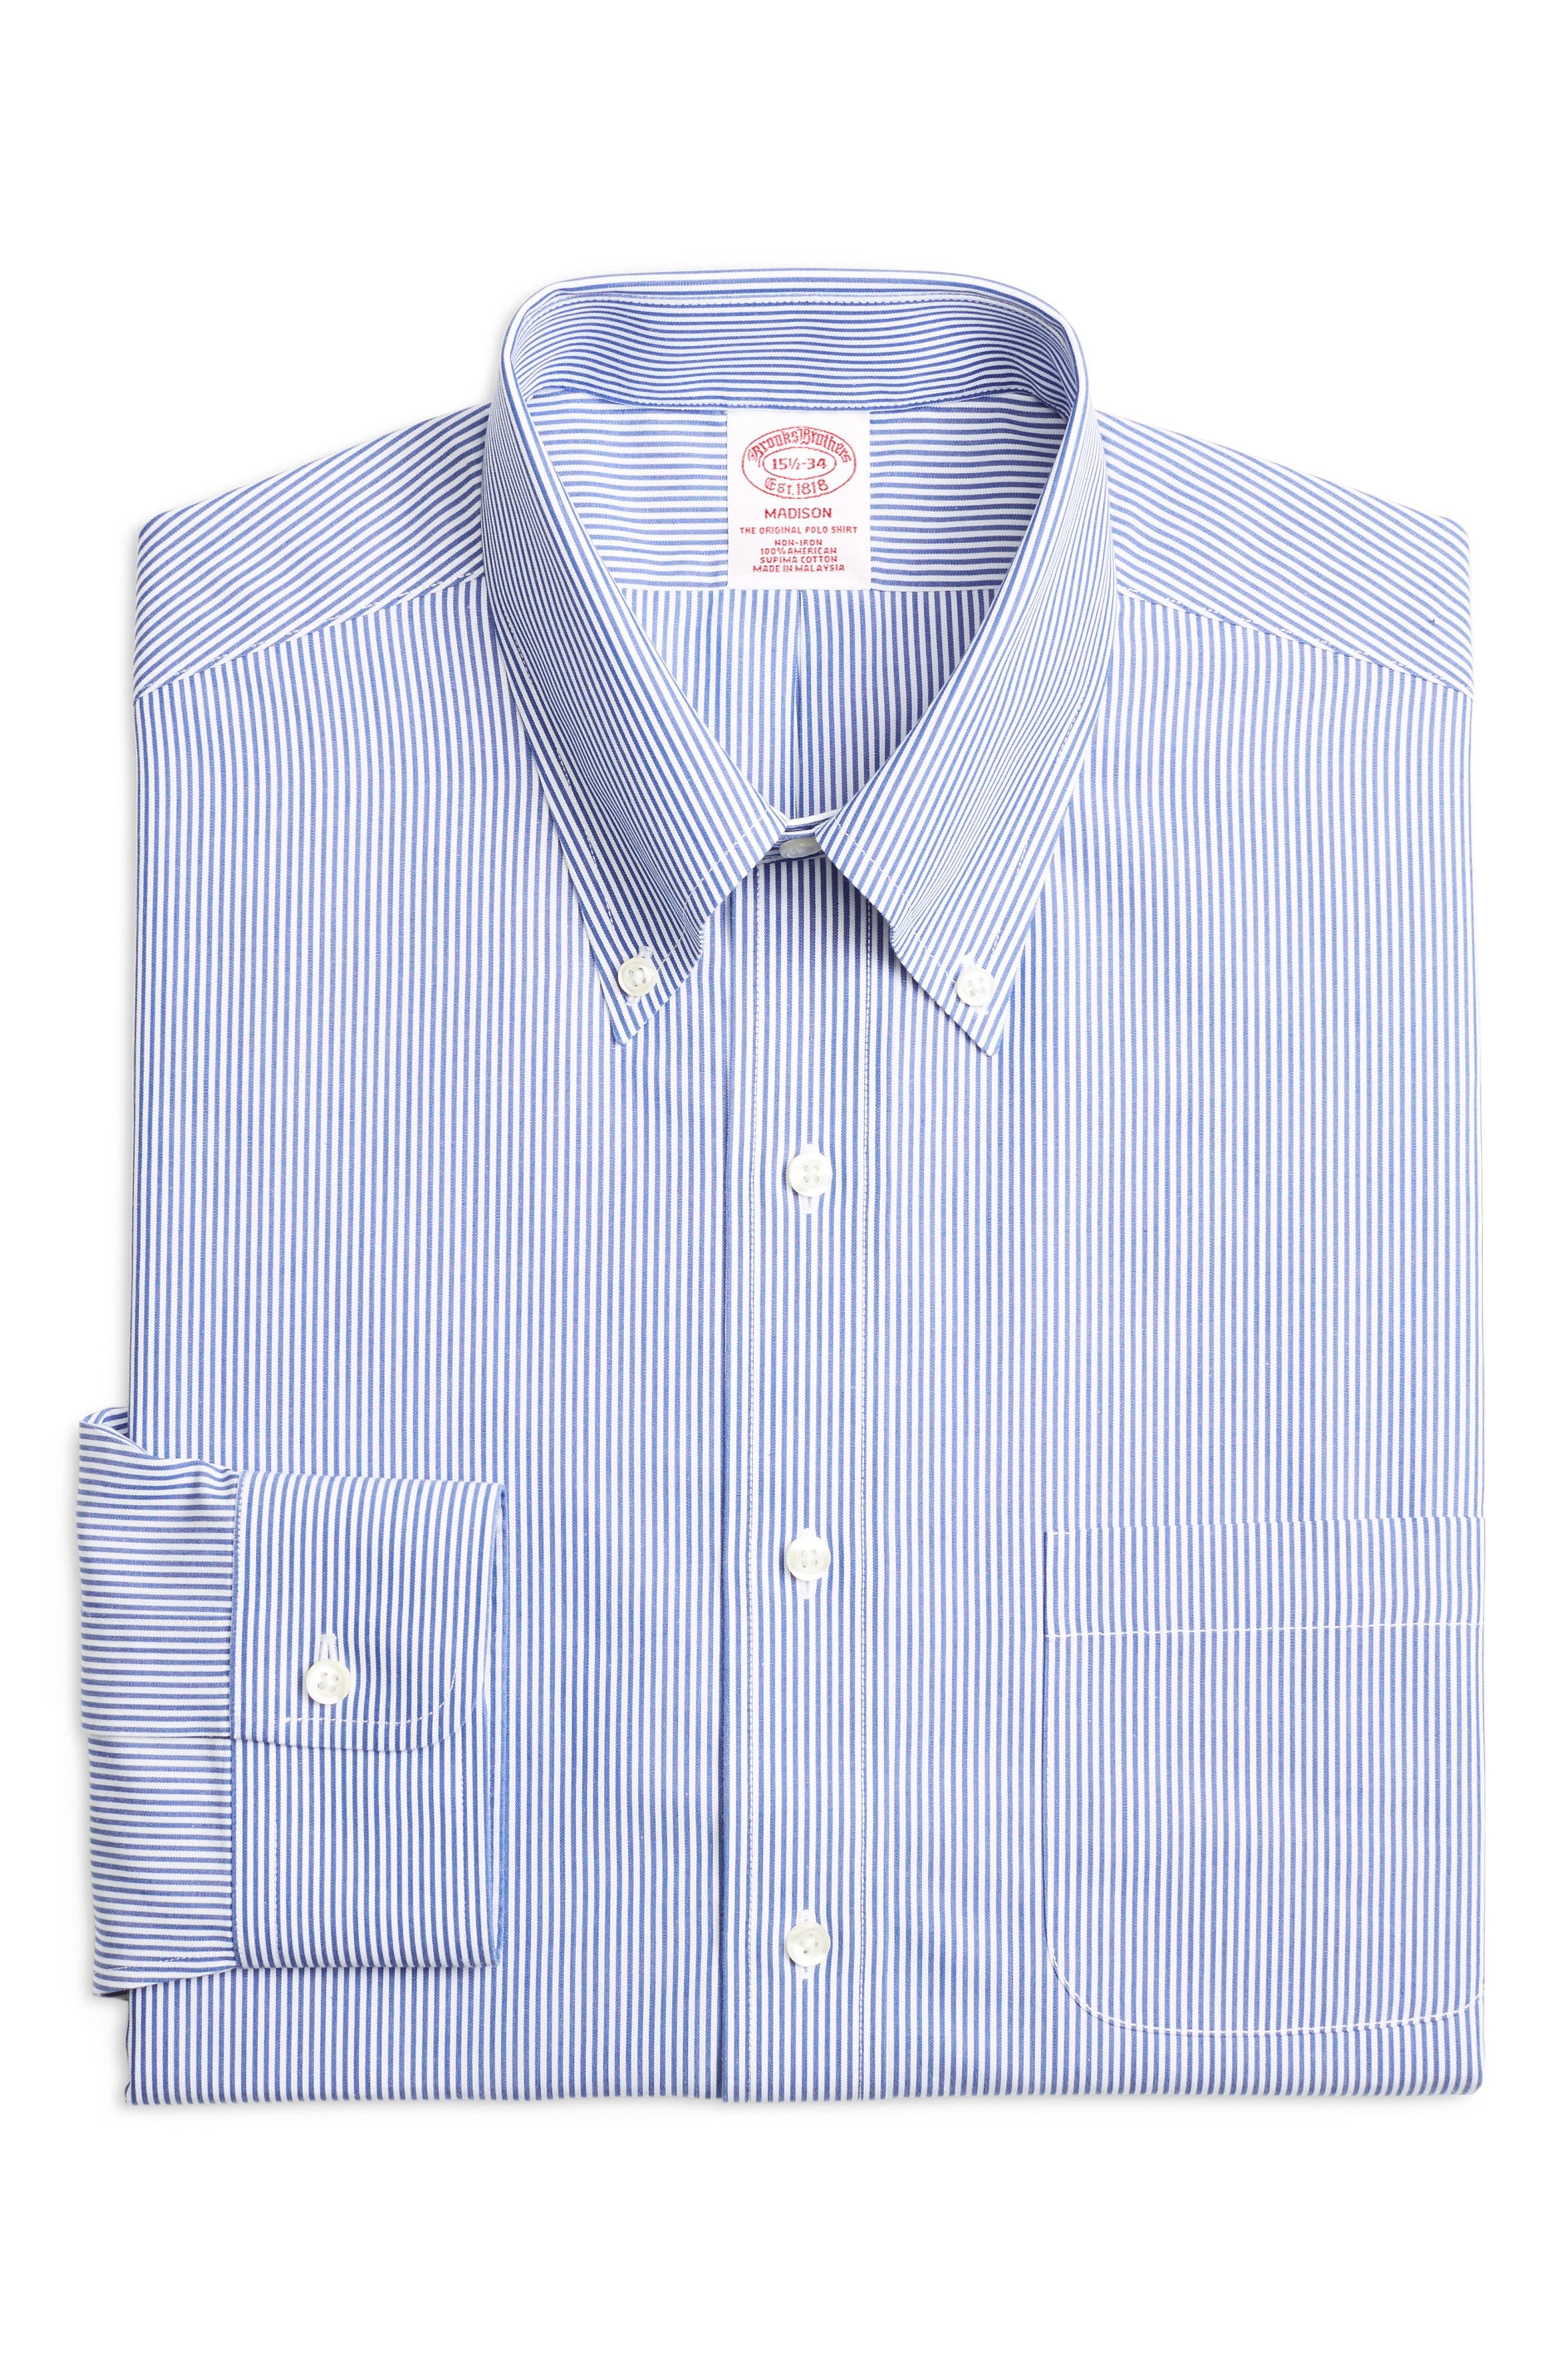 Classic Fit Stripe Dress Shirt,                             Main thumbnail 1, color,                             BLUE